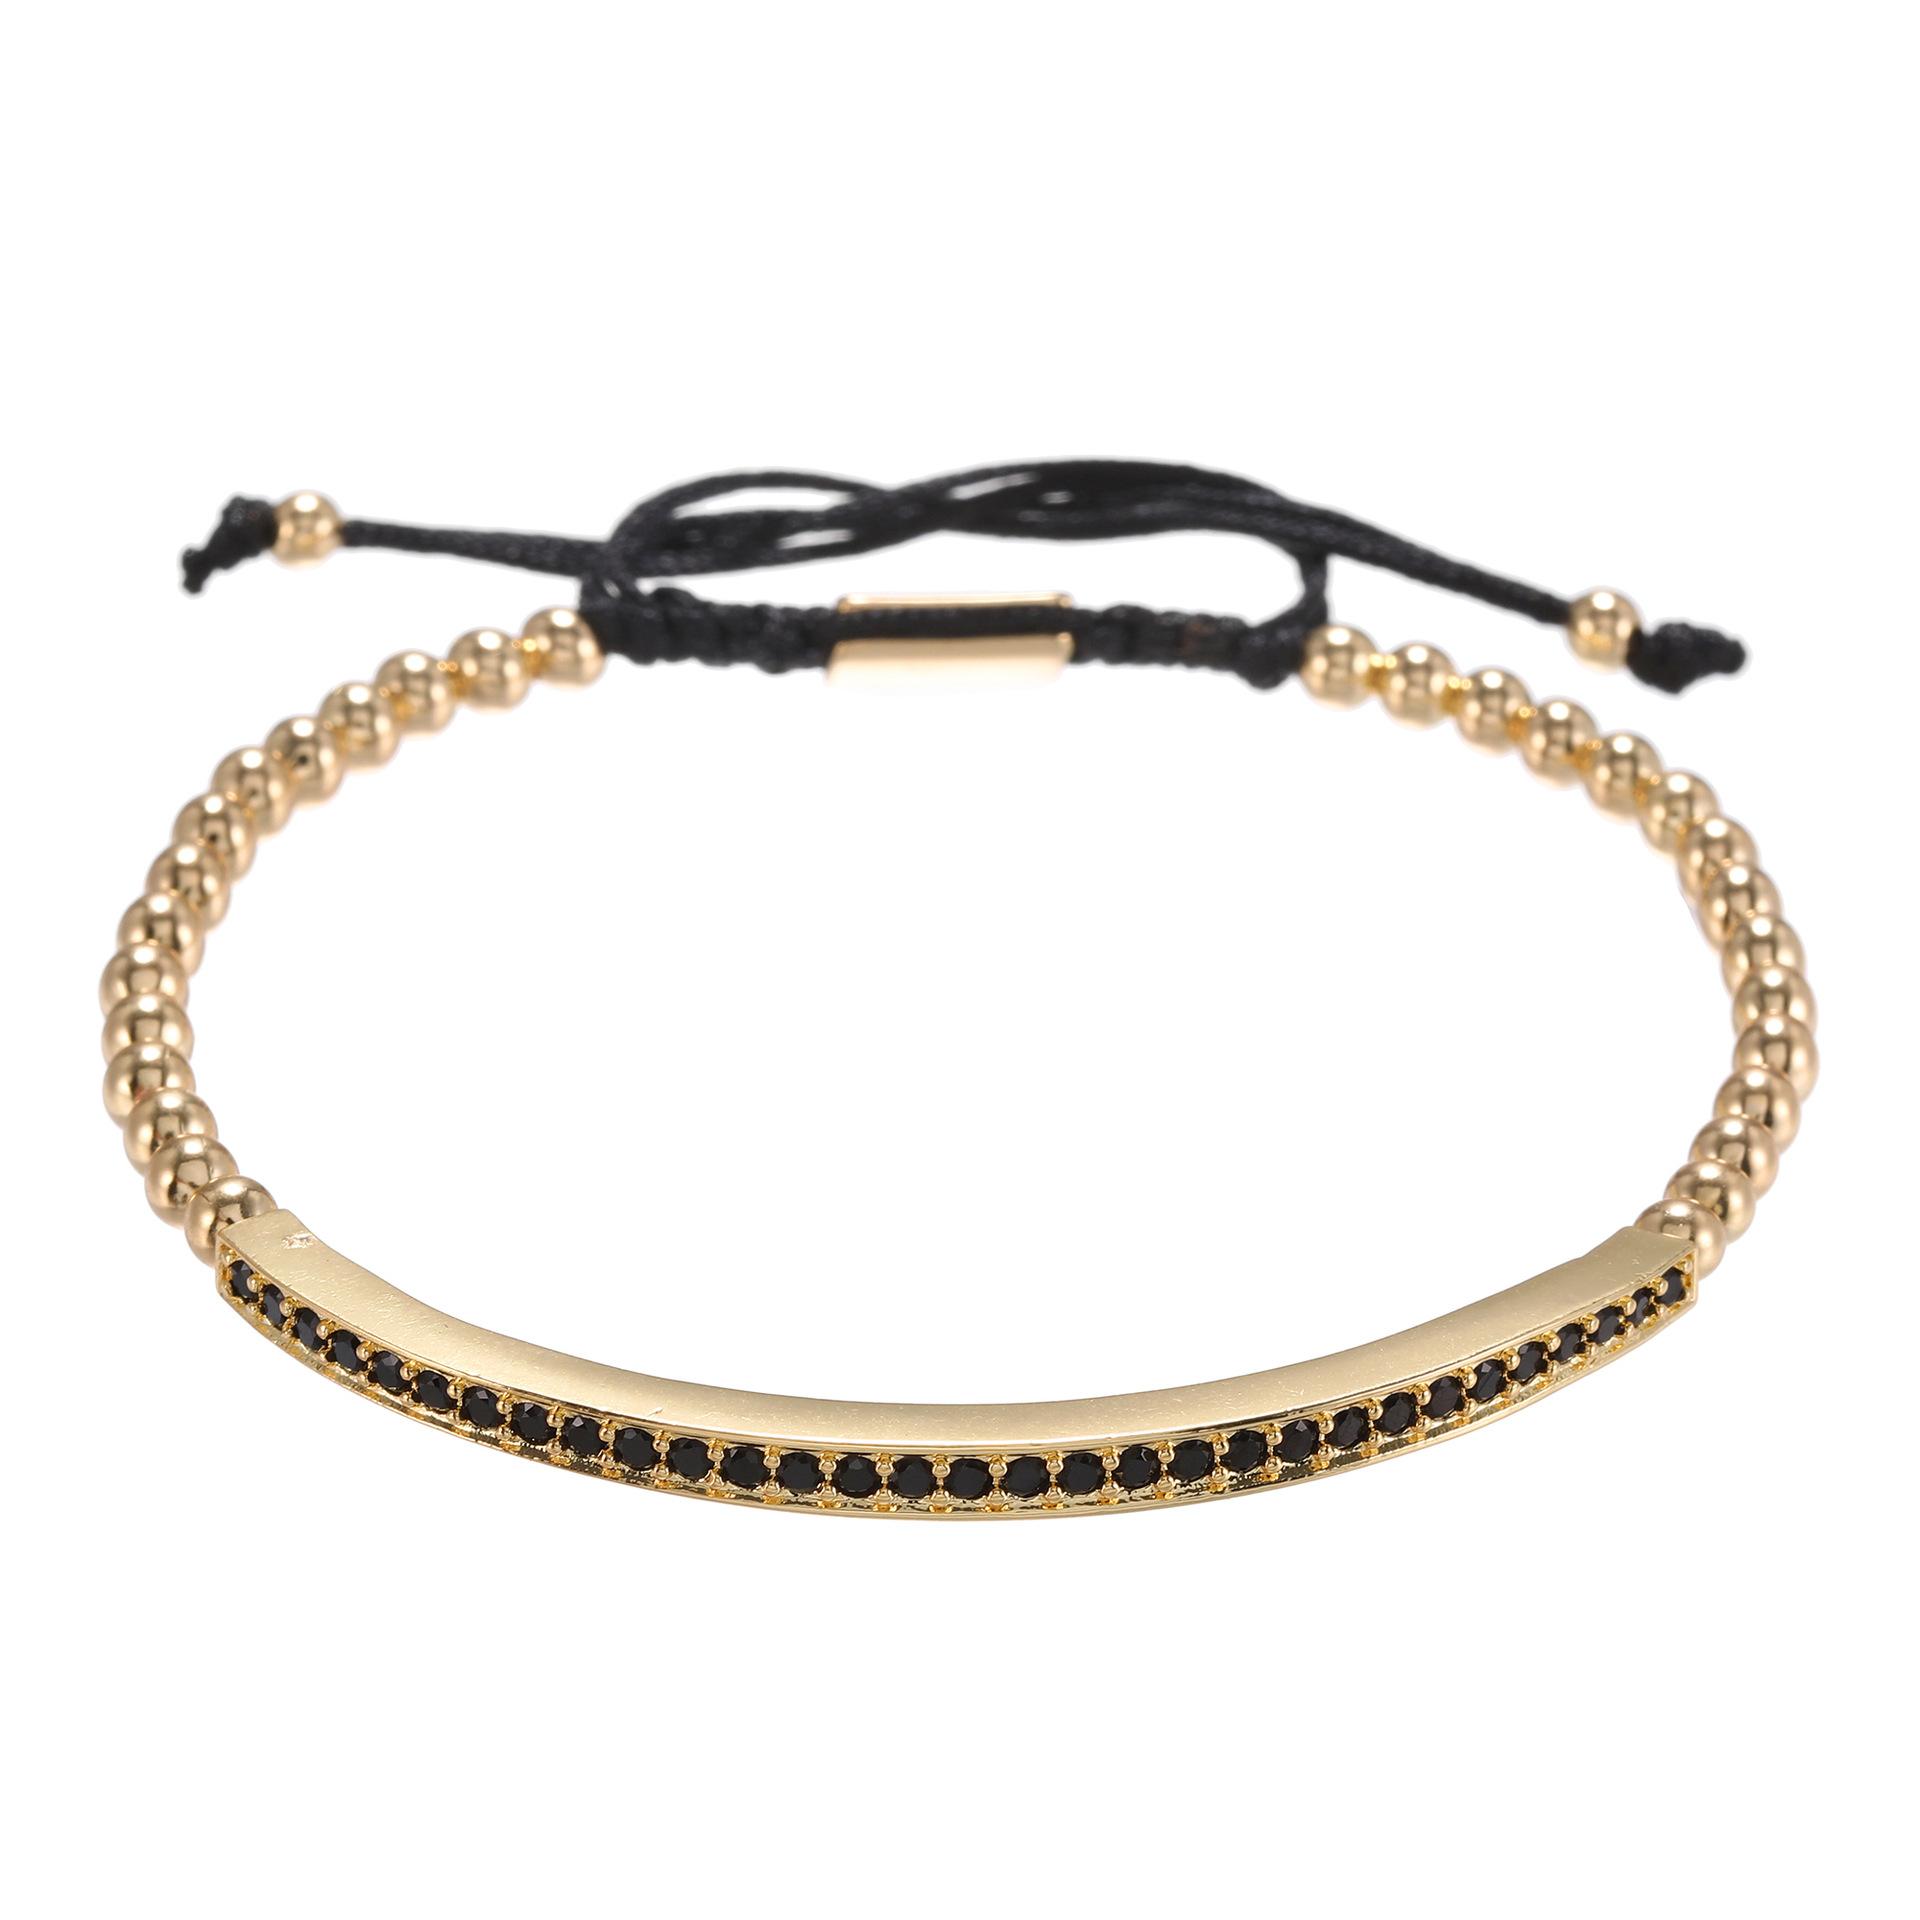 fashion copper inlaid zirconium bracelet NHZU315282